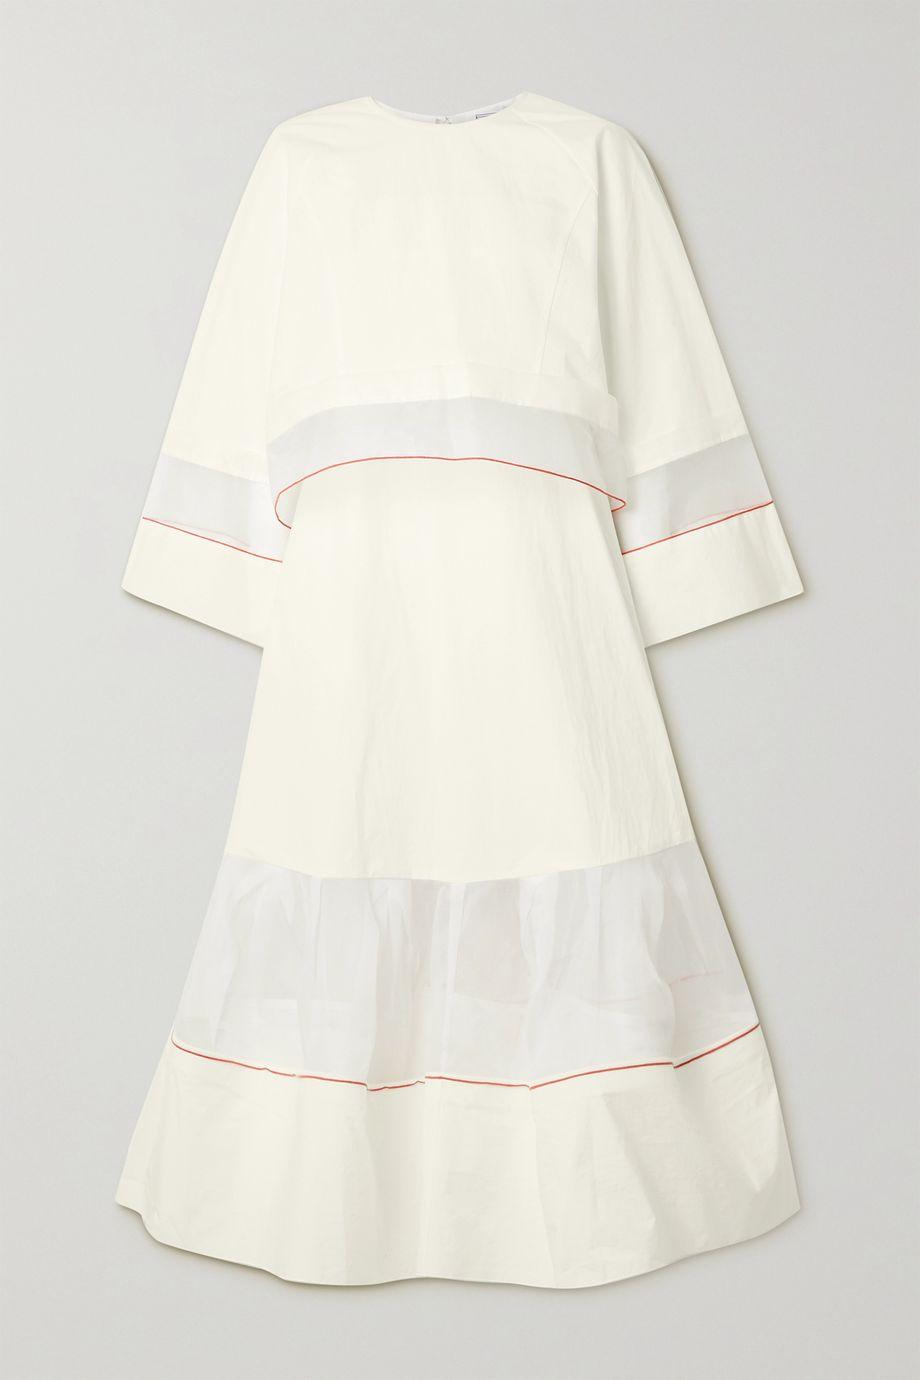 Rosie Assoulin Convertible layered organza-trimmed cotton-poplin maxi dress